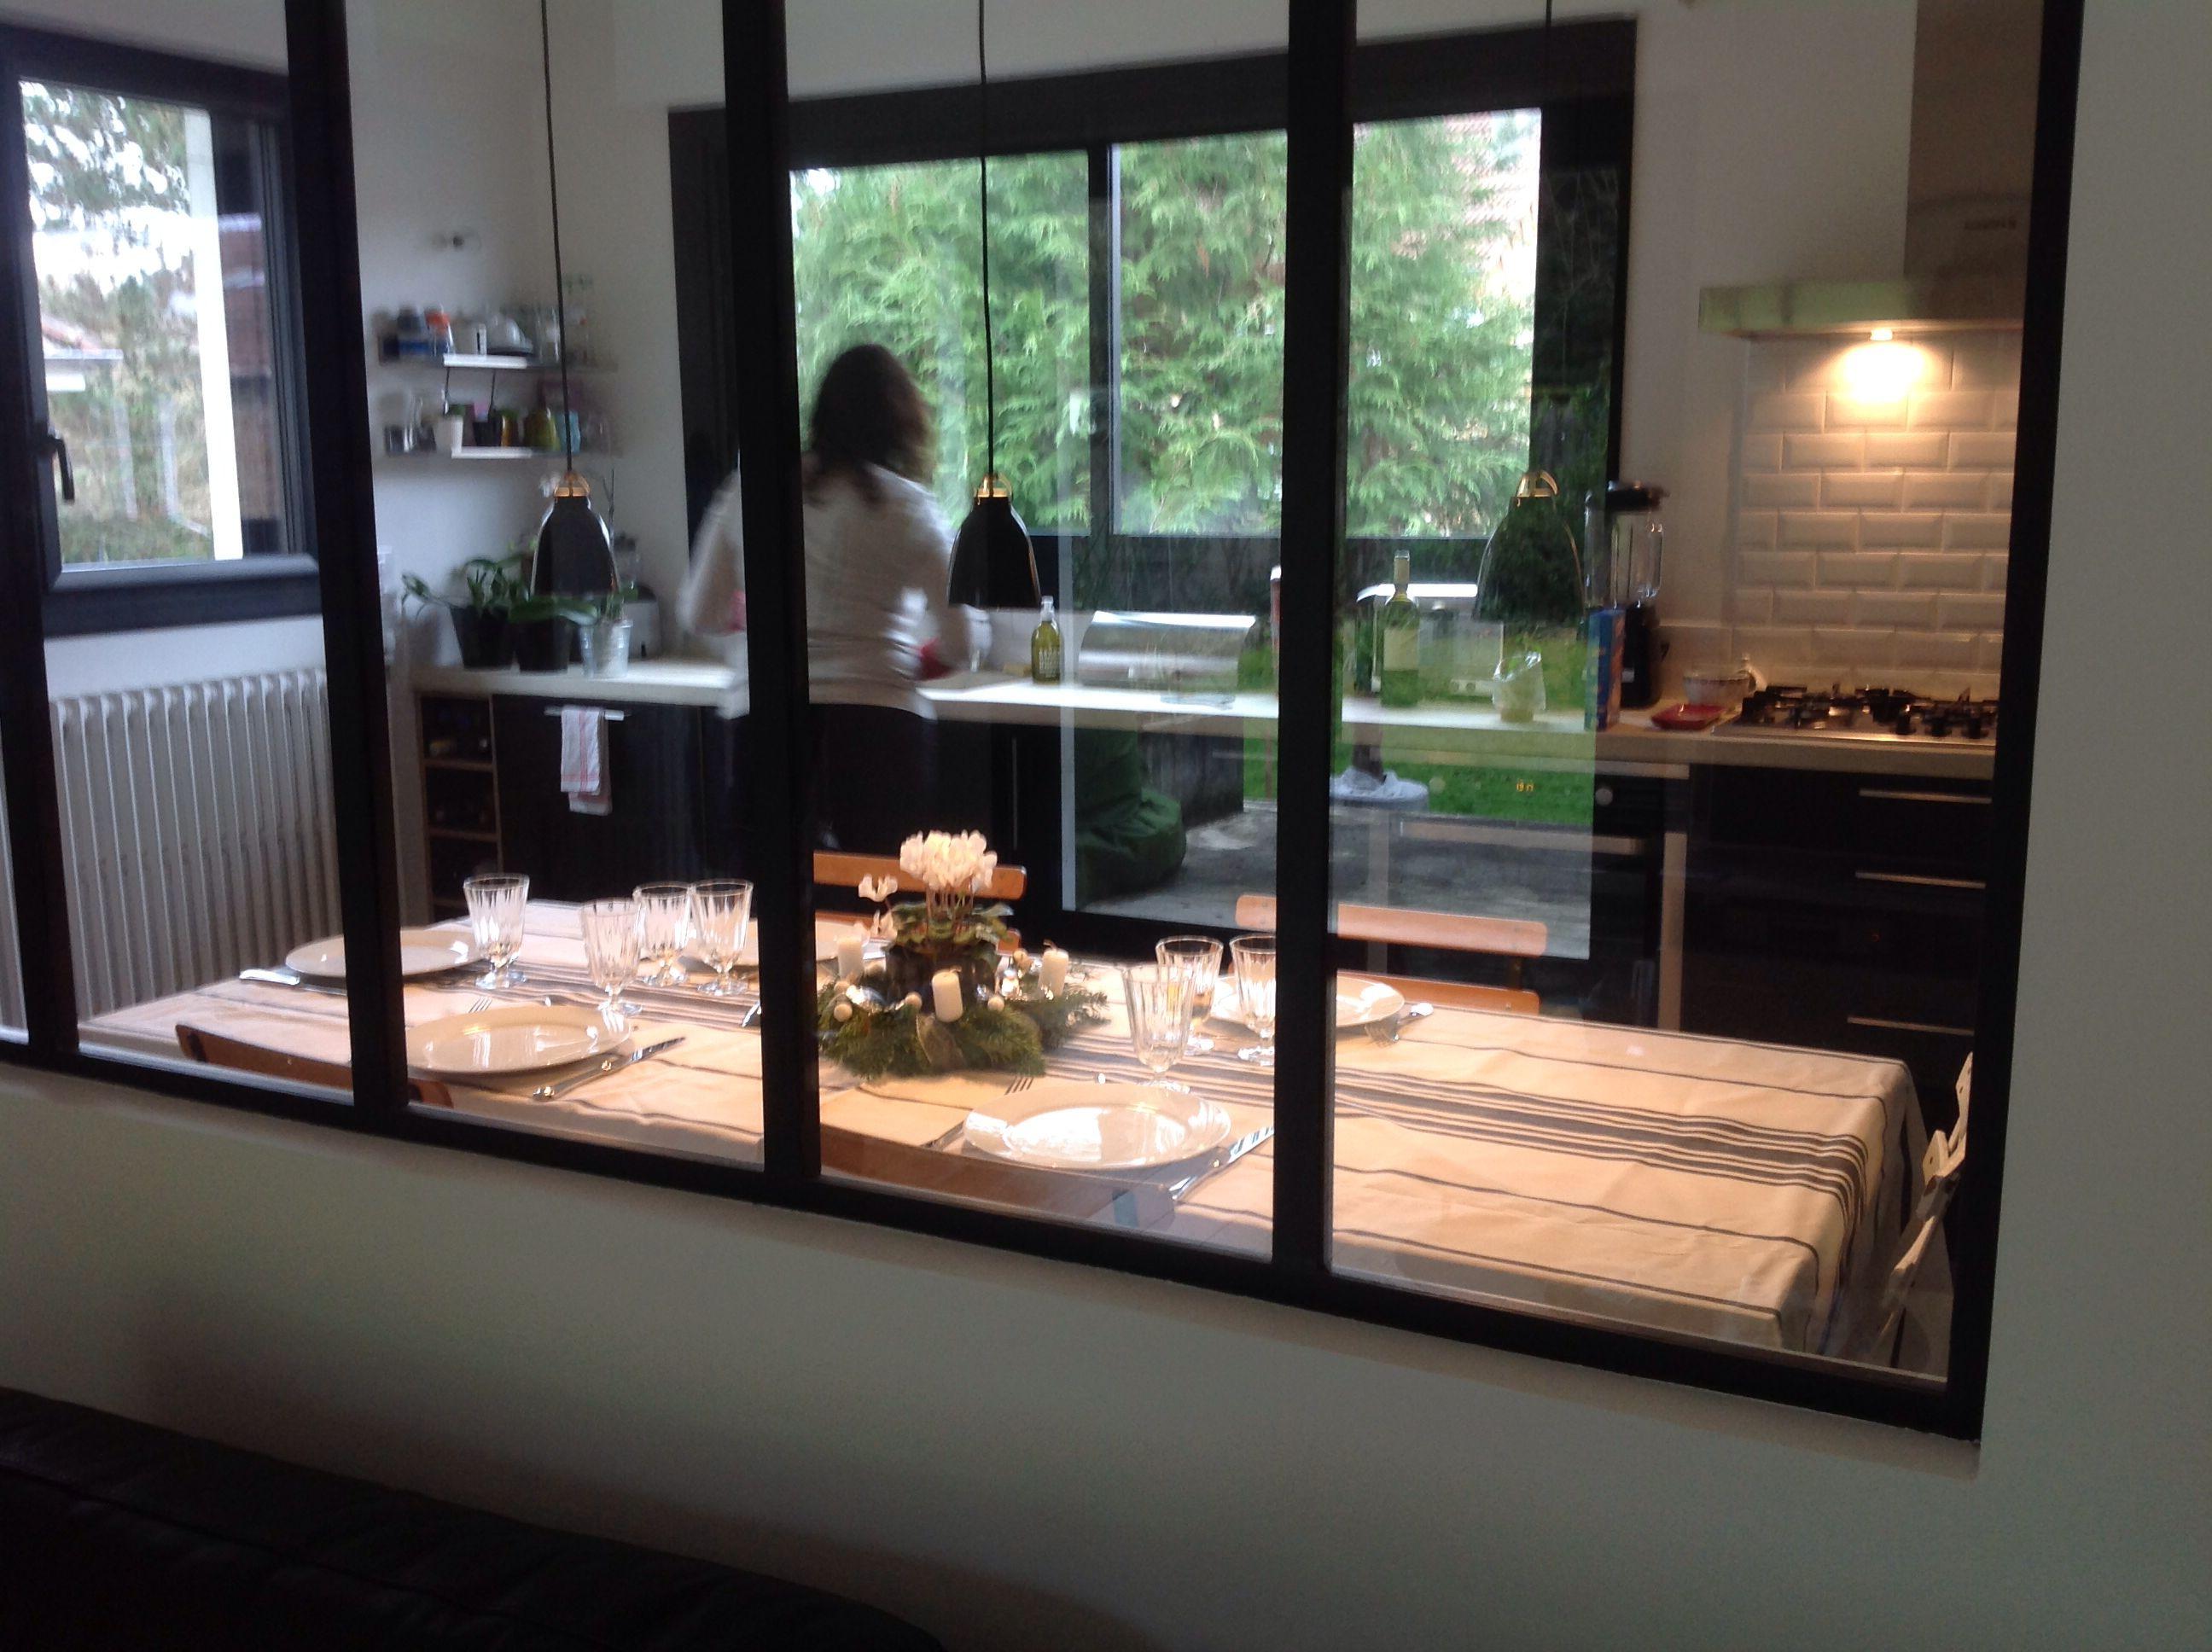 Cuisine avec verri re cuisine type industriel avec - Carreau porte vitree ...